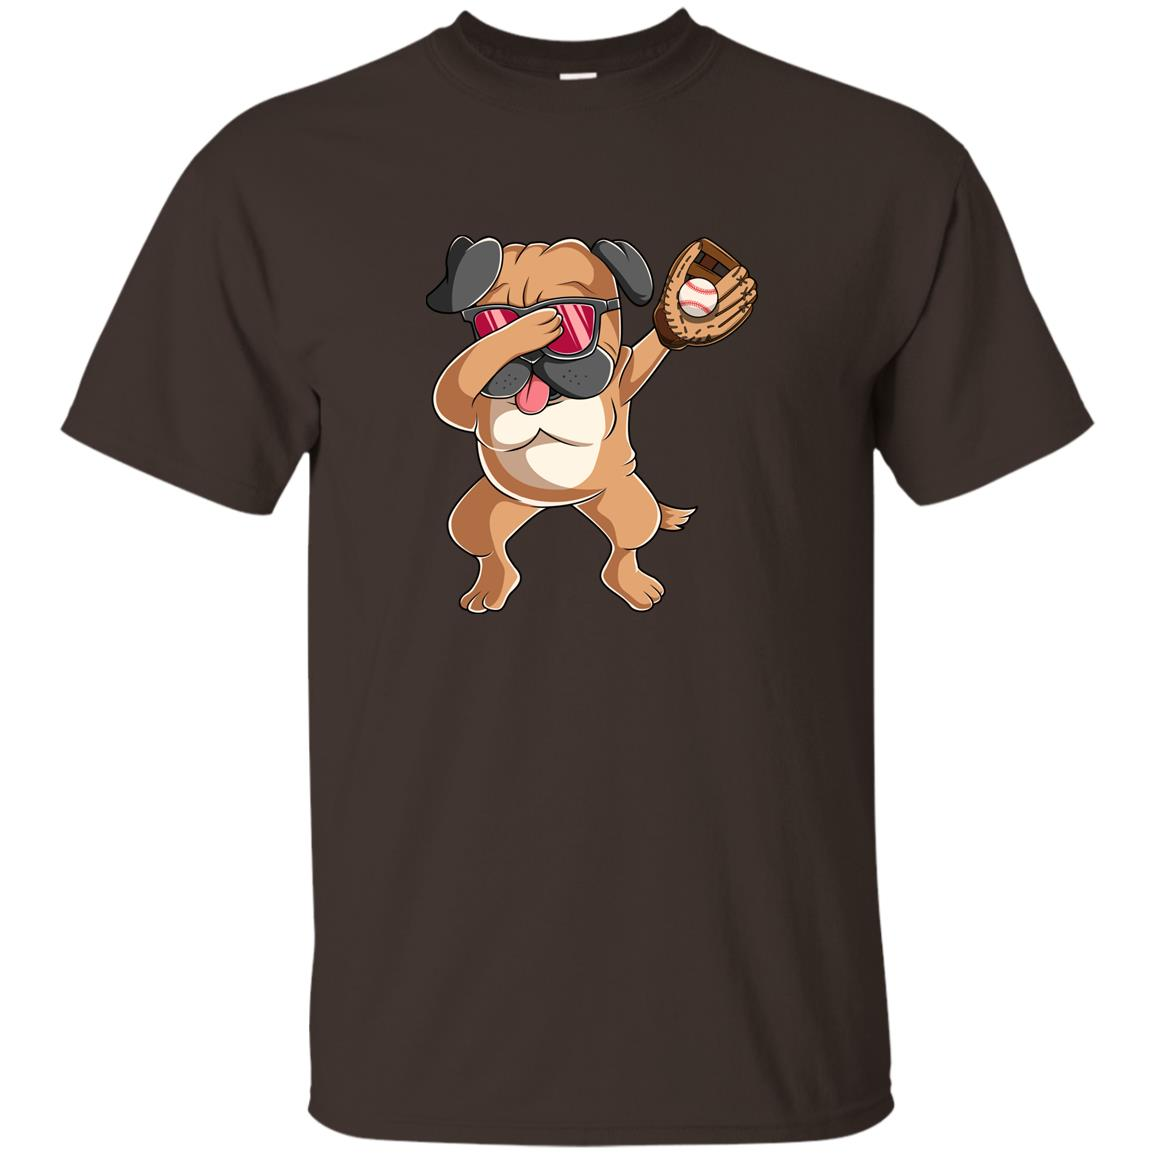 Dabbing Pug Baseball Kids Funny Dab Dance Gift Unisex Short Sleeve